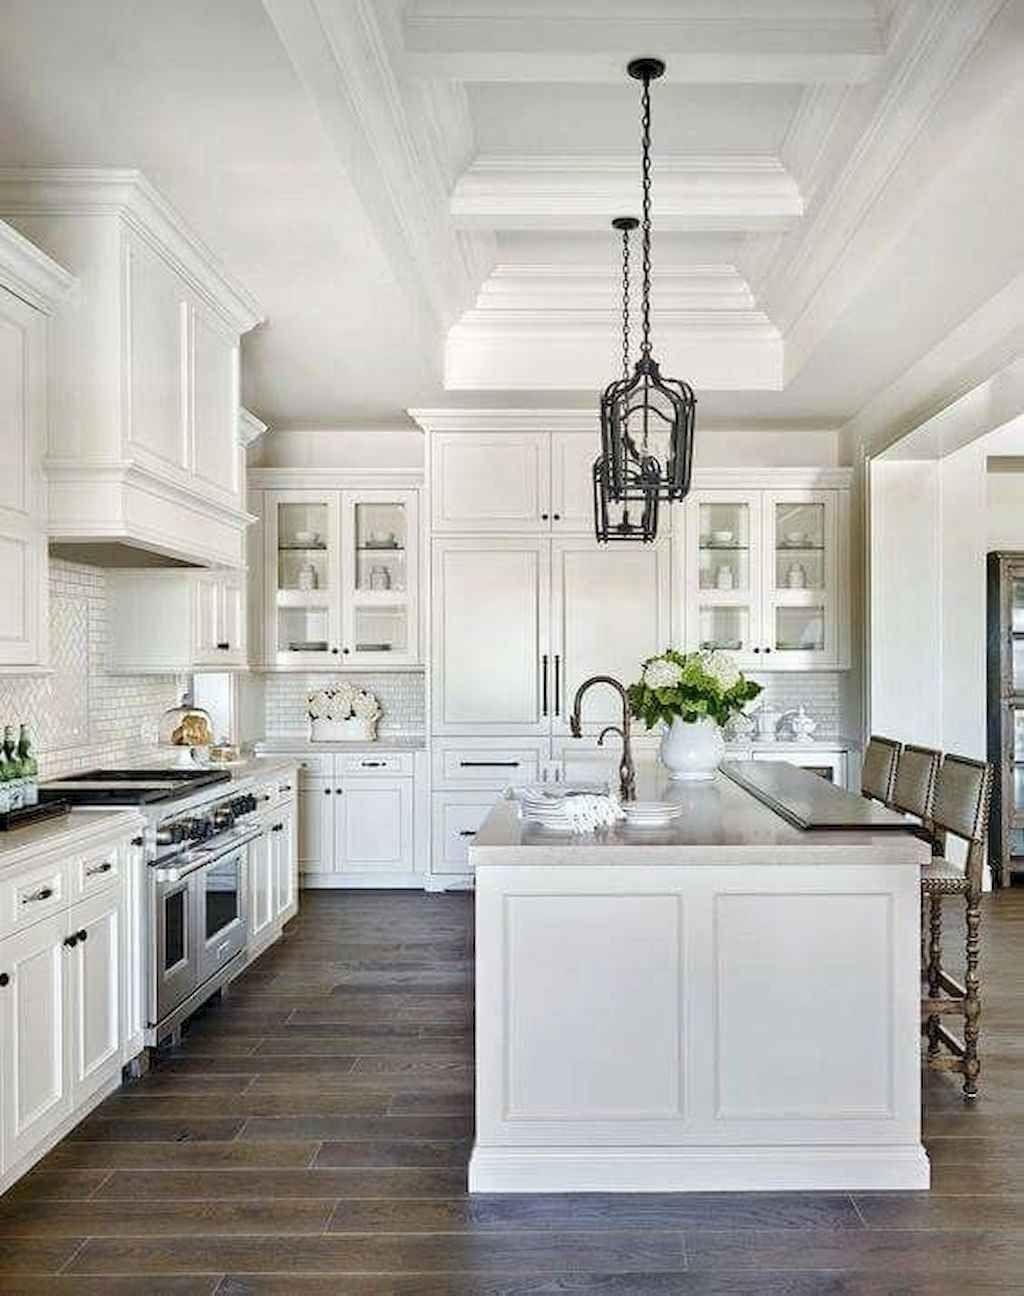 Farmhouse White Kitchen Cabinets